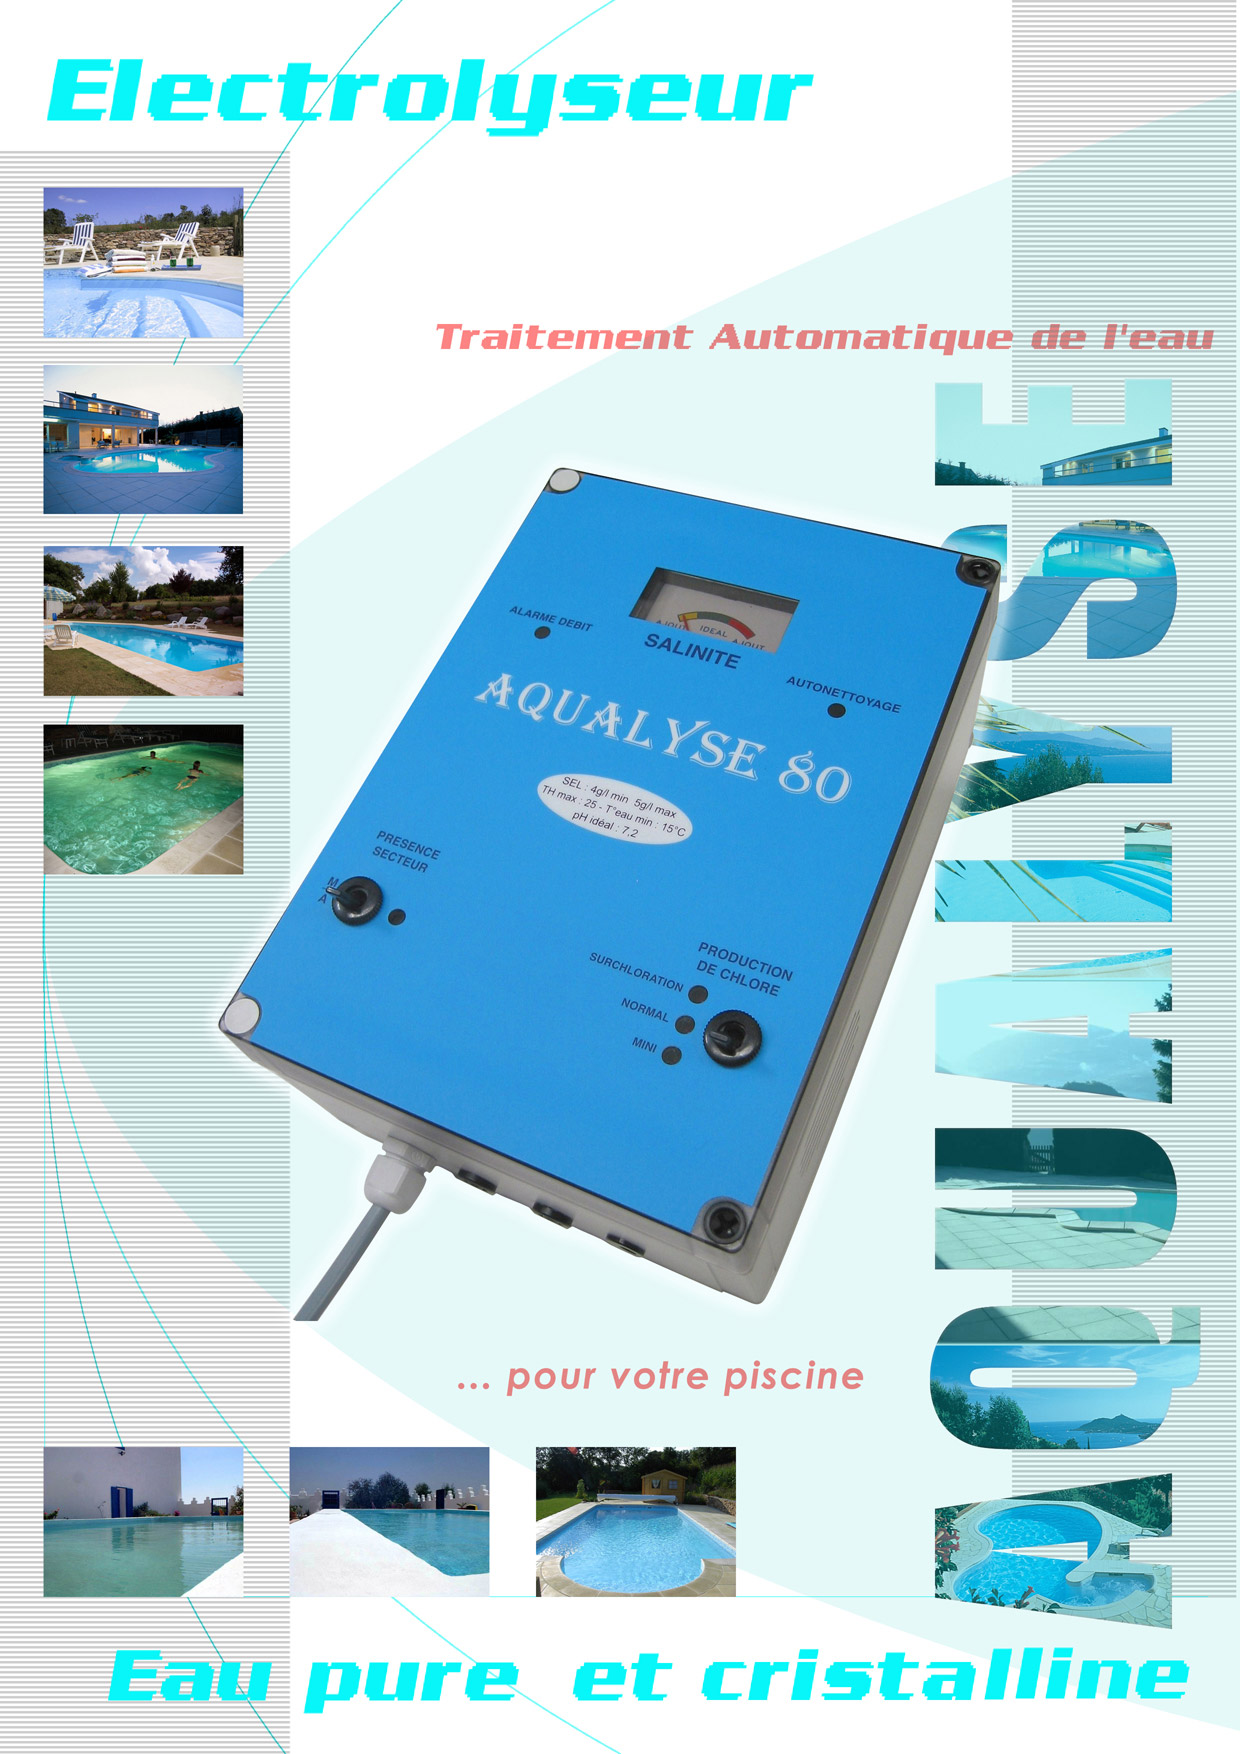 electrolyseur osec-b